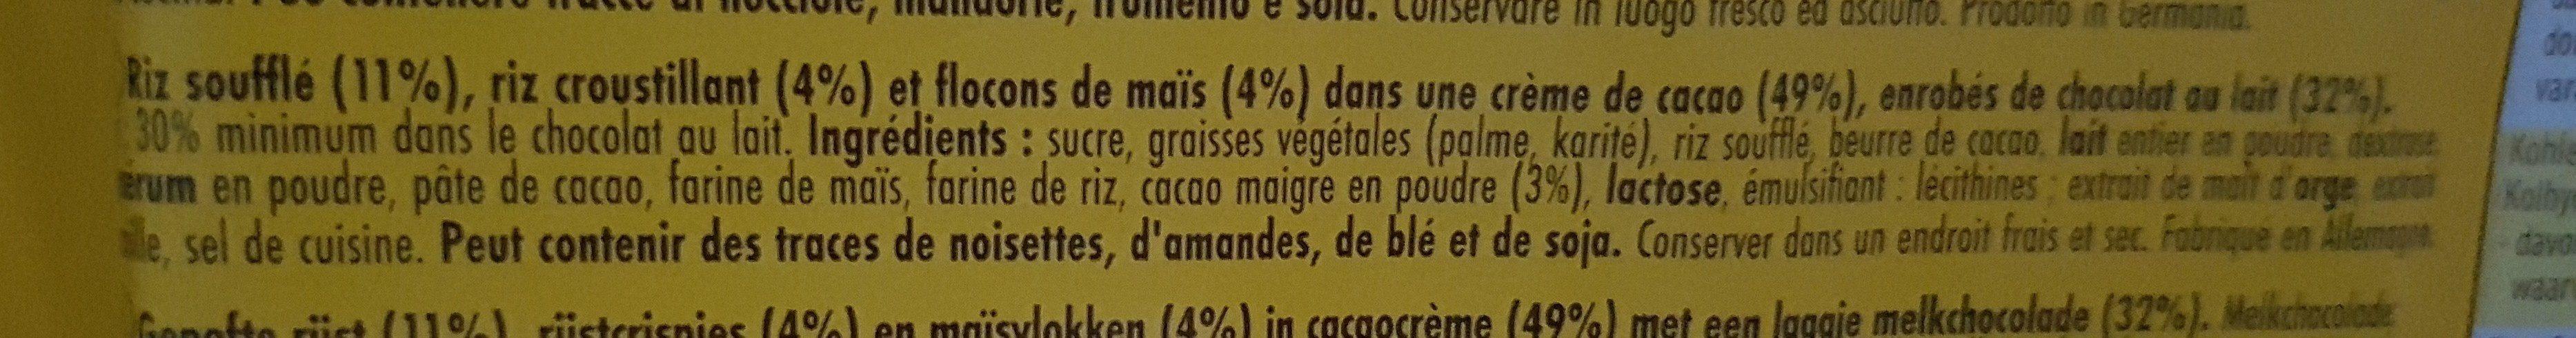 Crunchy happen - Ingredients - fr